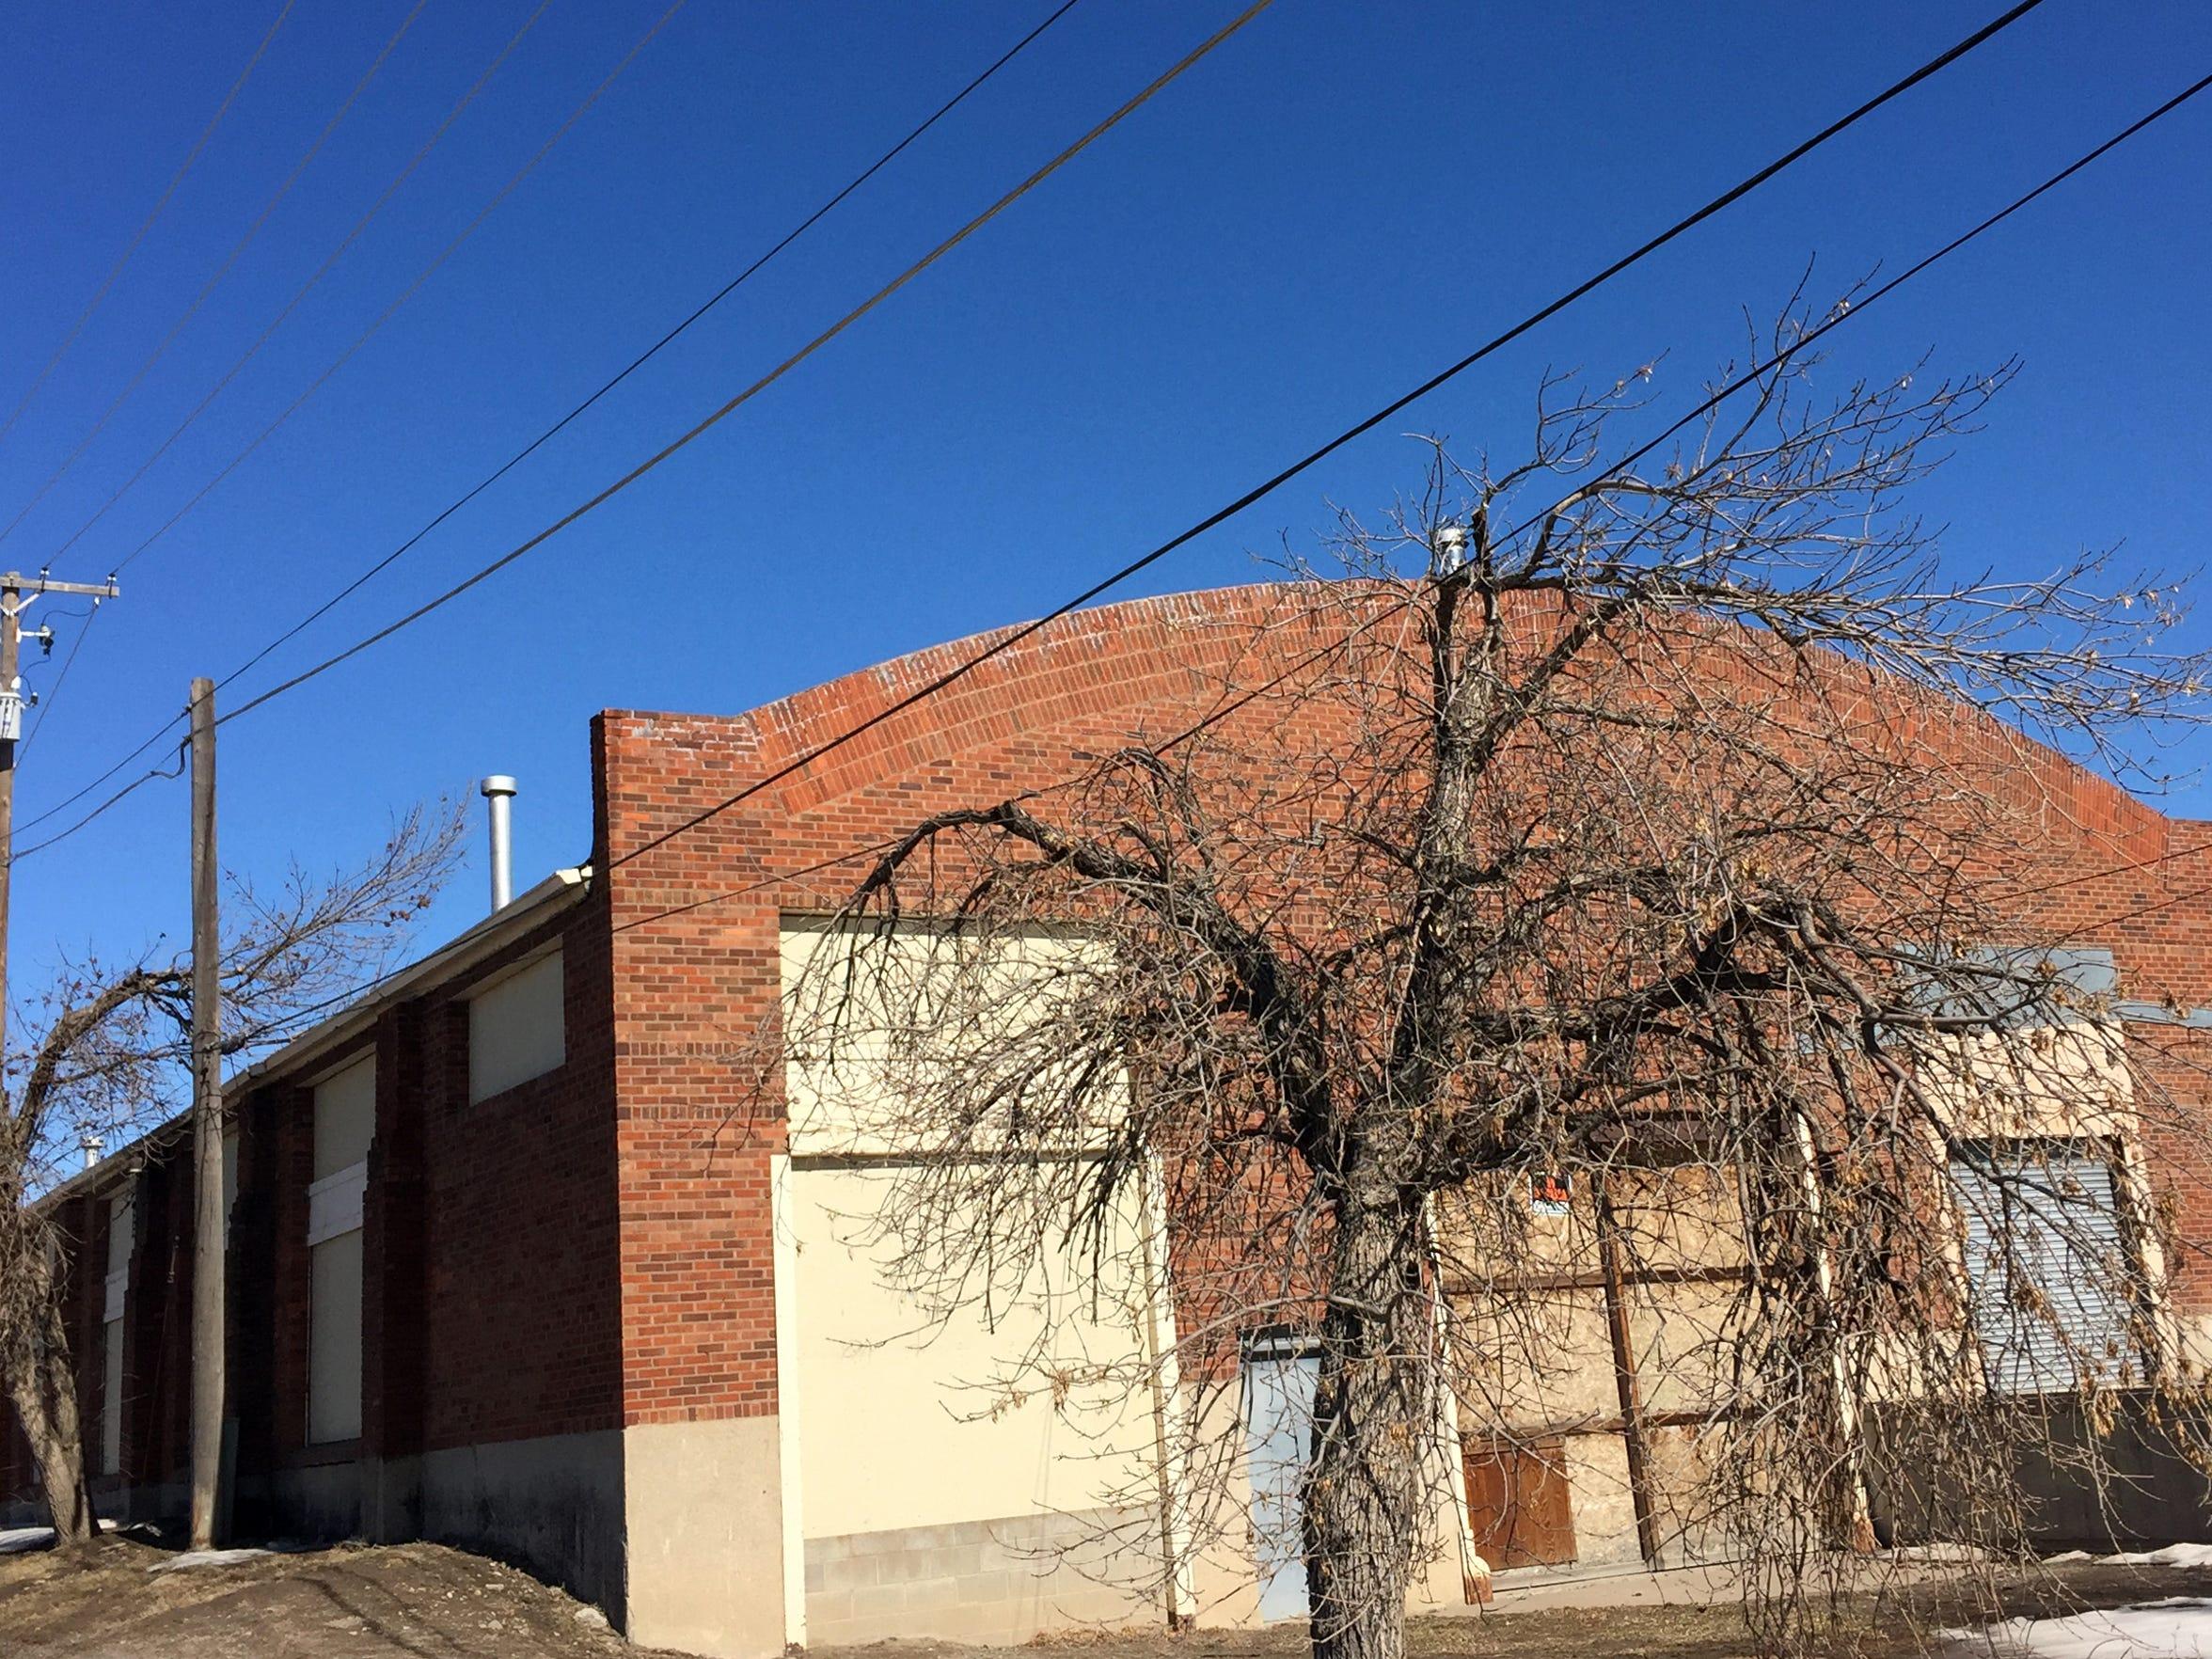 A historic barrel-roof building along Central Avenue